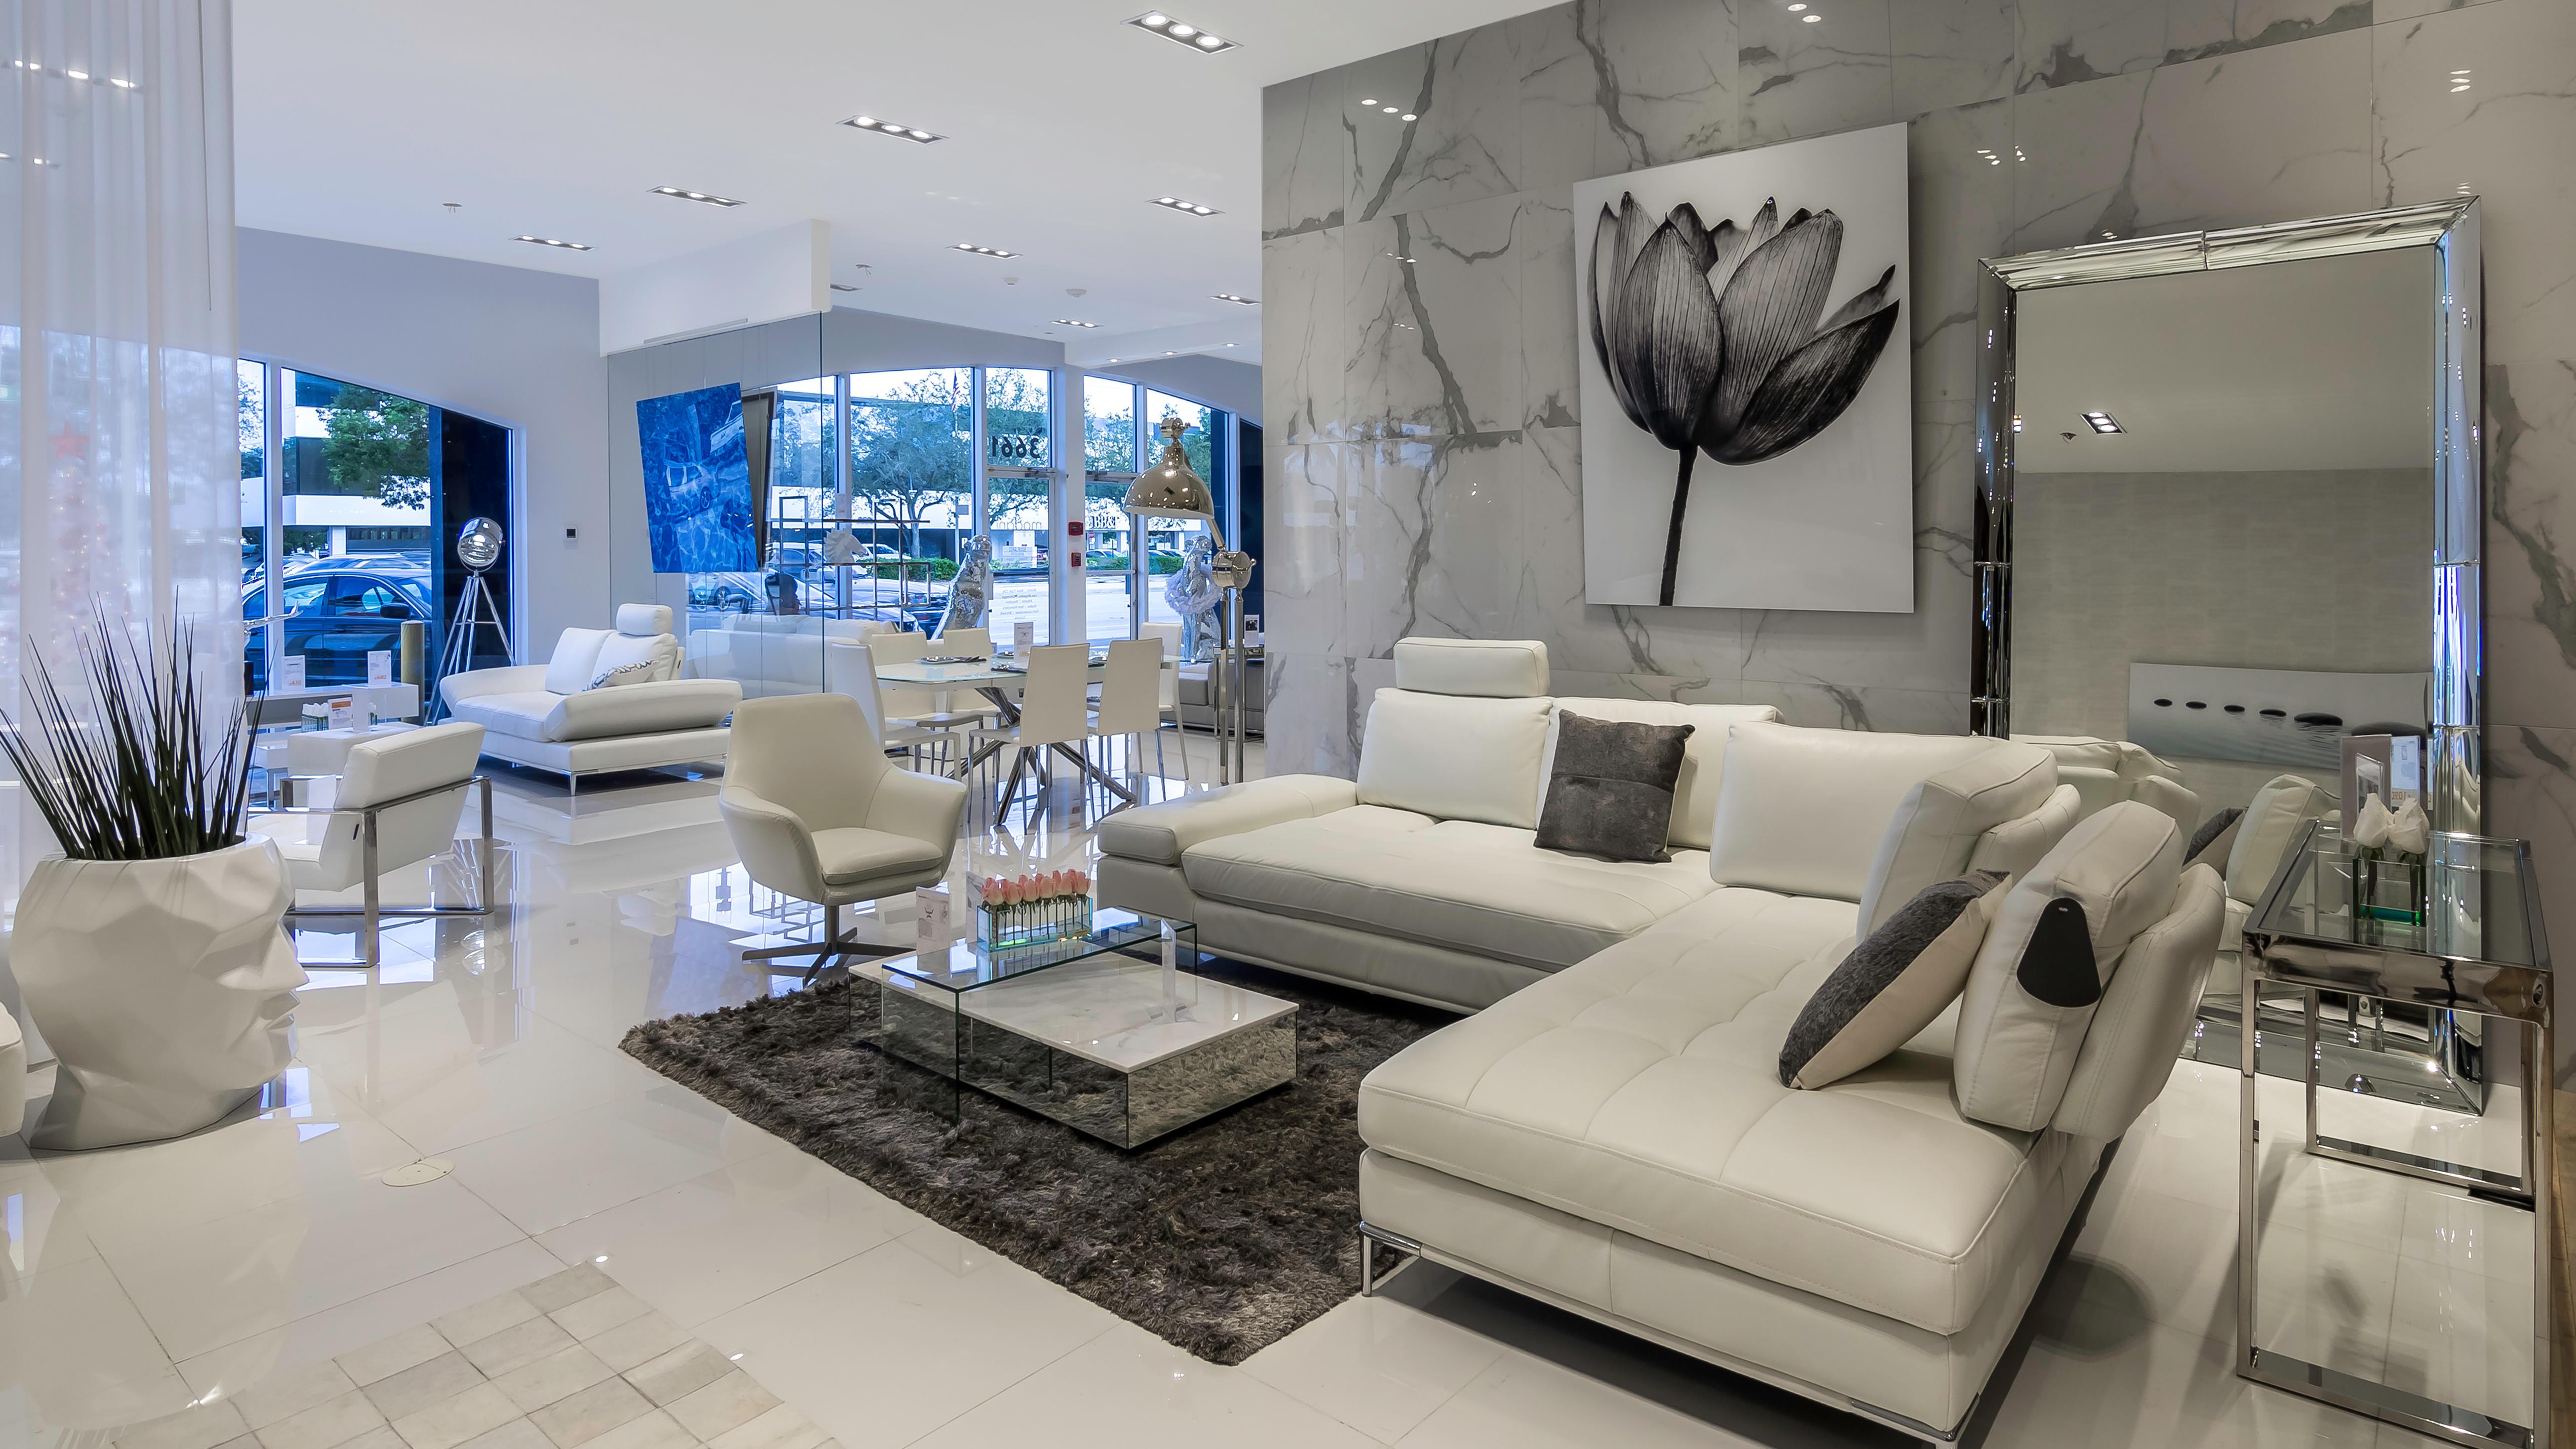 Modani Furniture Fort Lauderdale 3661 N Federal Hwy Fort Lauderdale, FL  Furniture Stores   MapQuest